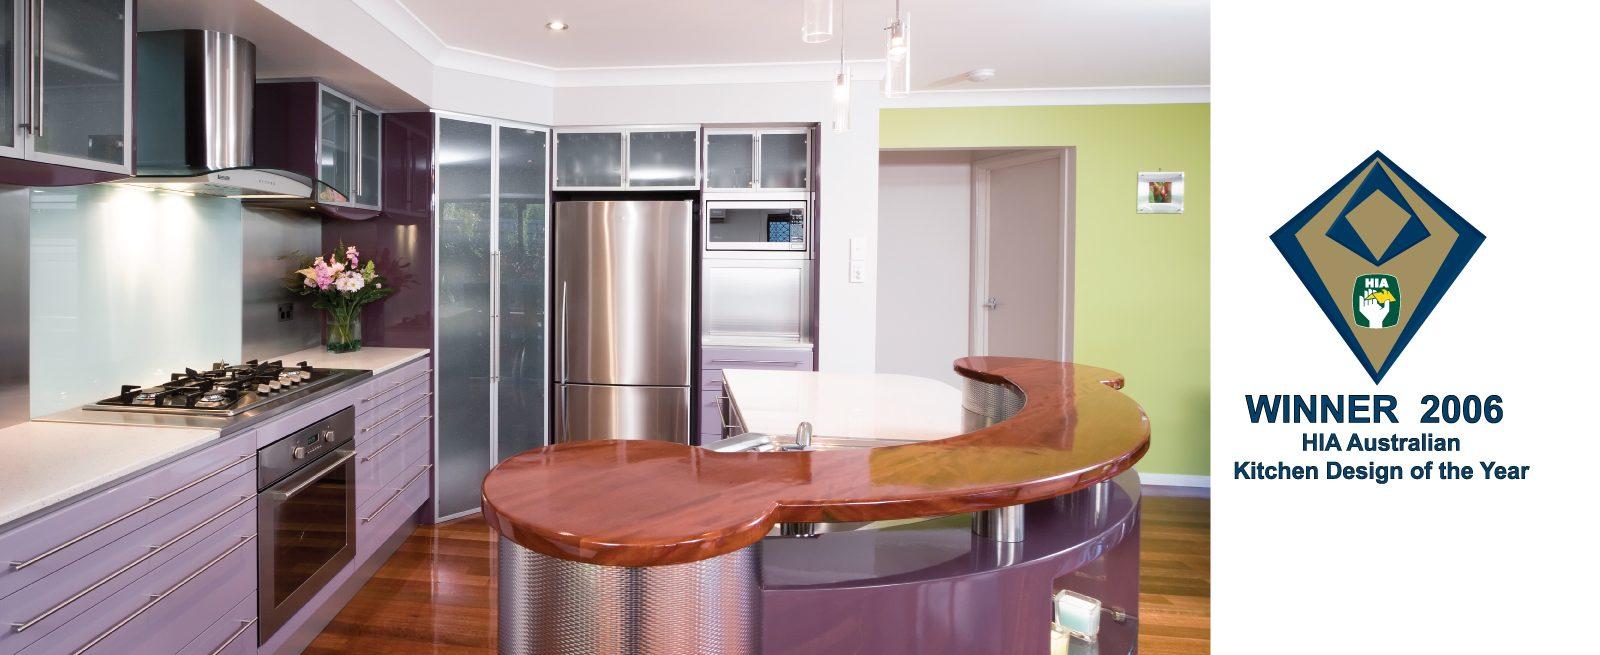 HIA Australian Kitchen Design of the Year - Kim Duffin